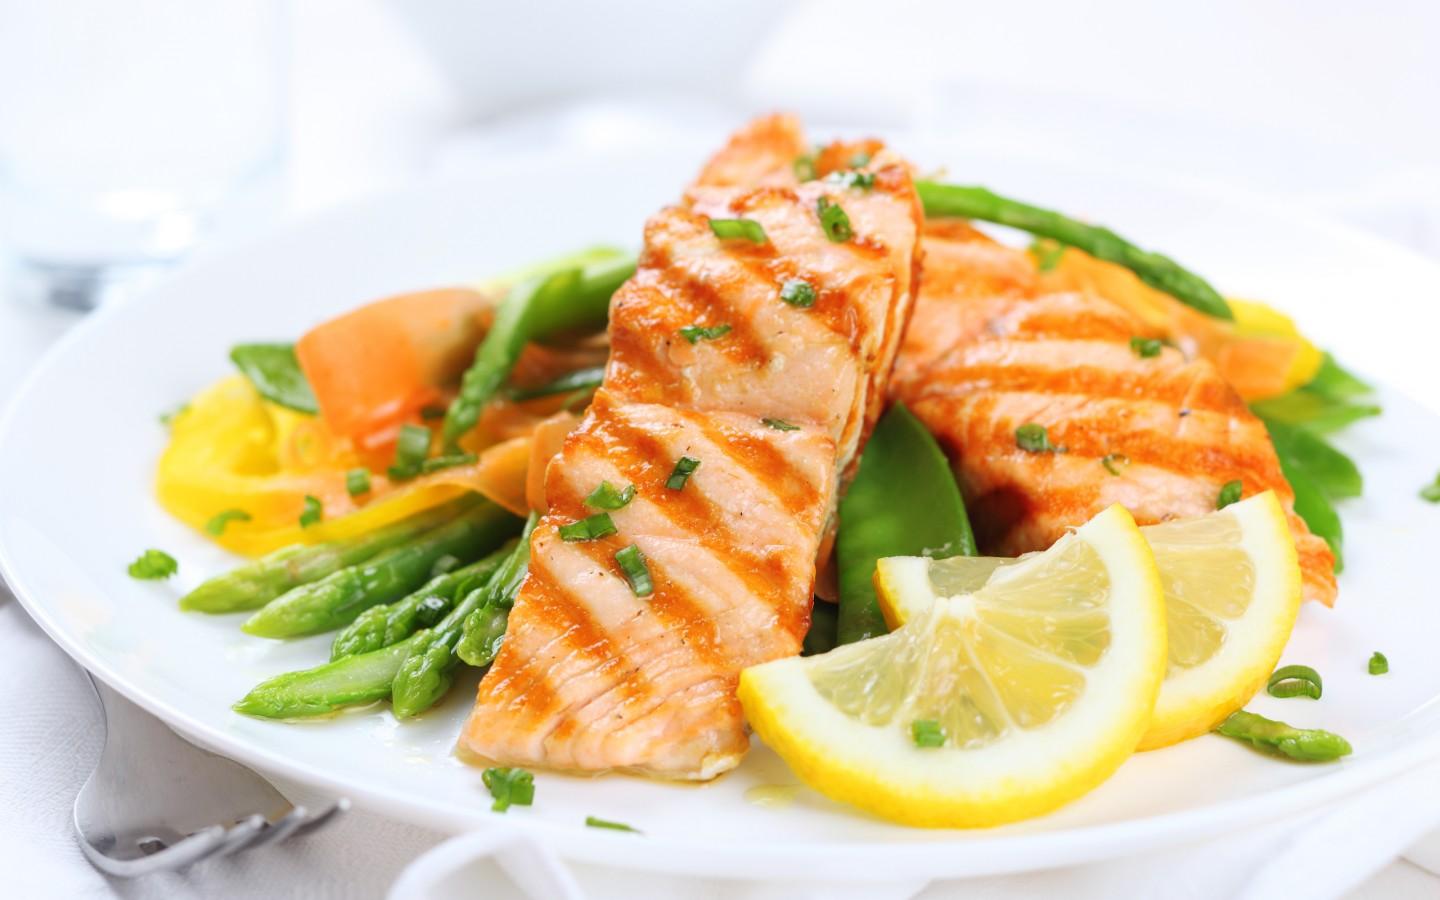 salmon-salad-wallpaper-42140-43133-hd-wallpapers